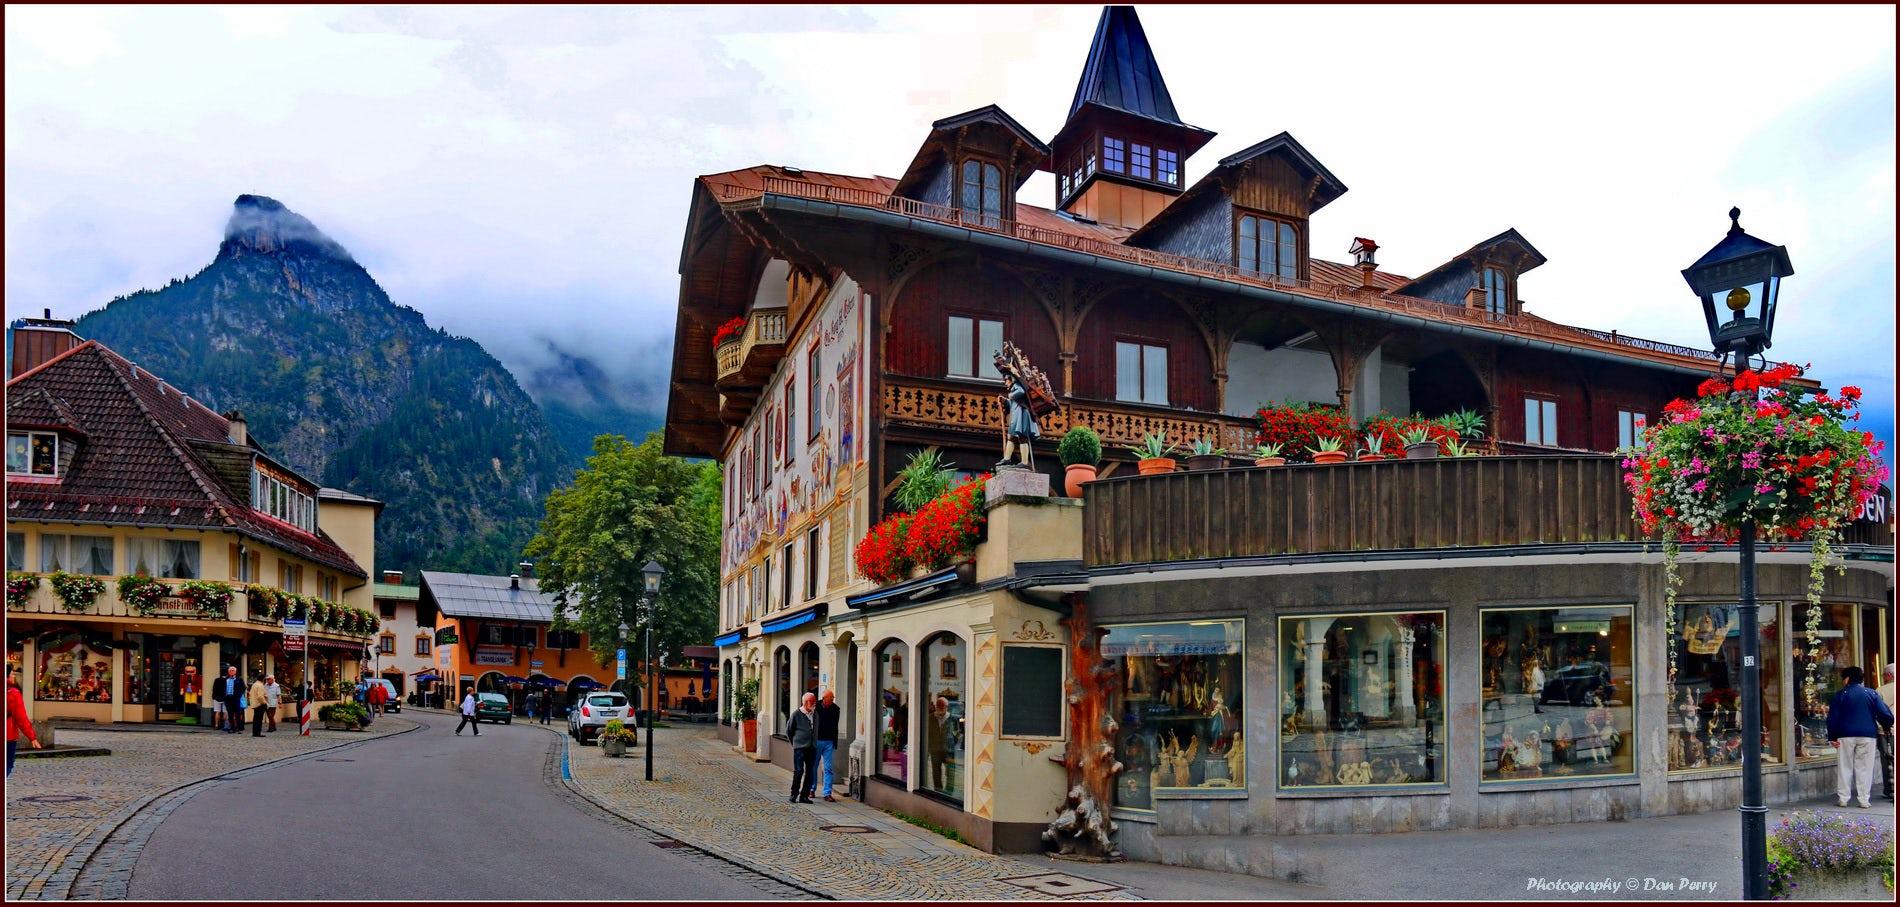 Oberammergau 2020 – 14 Days